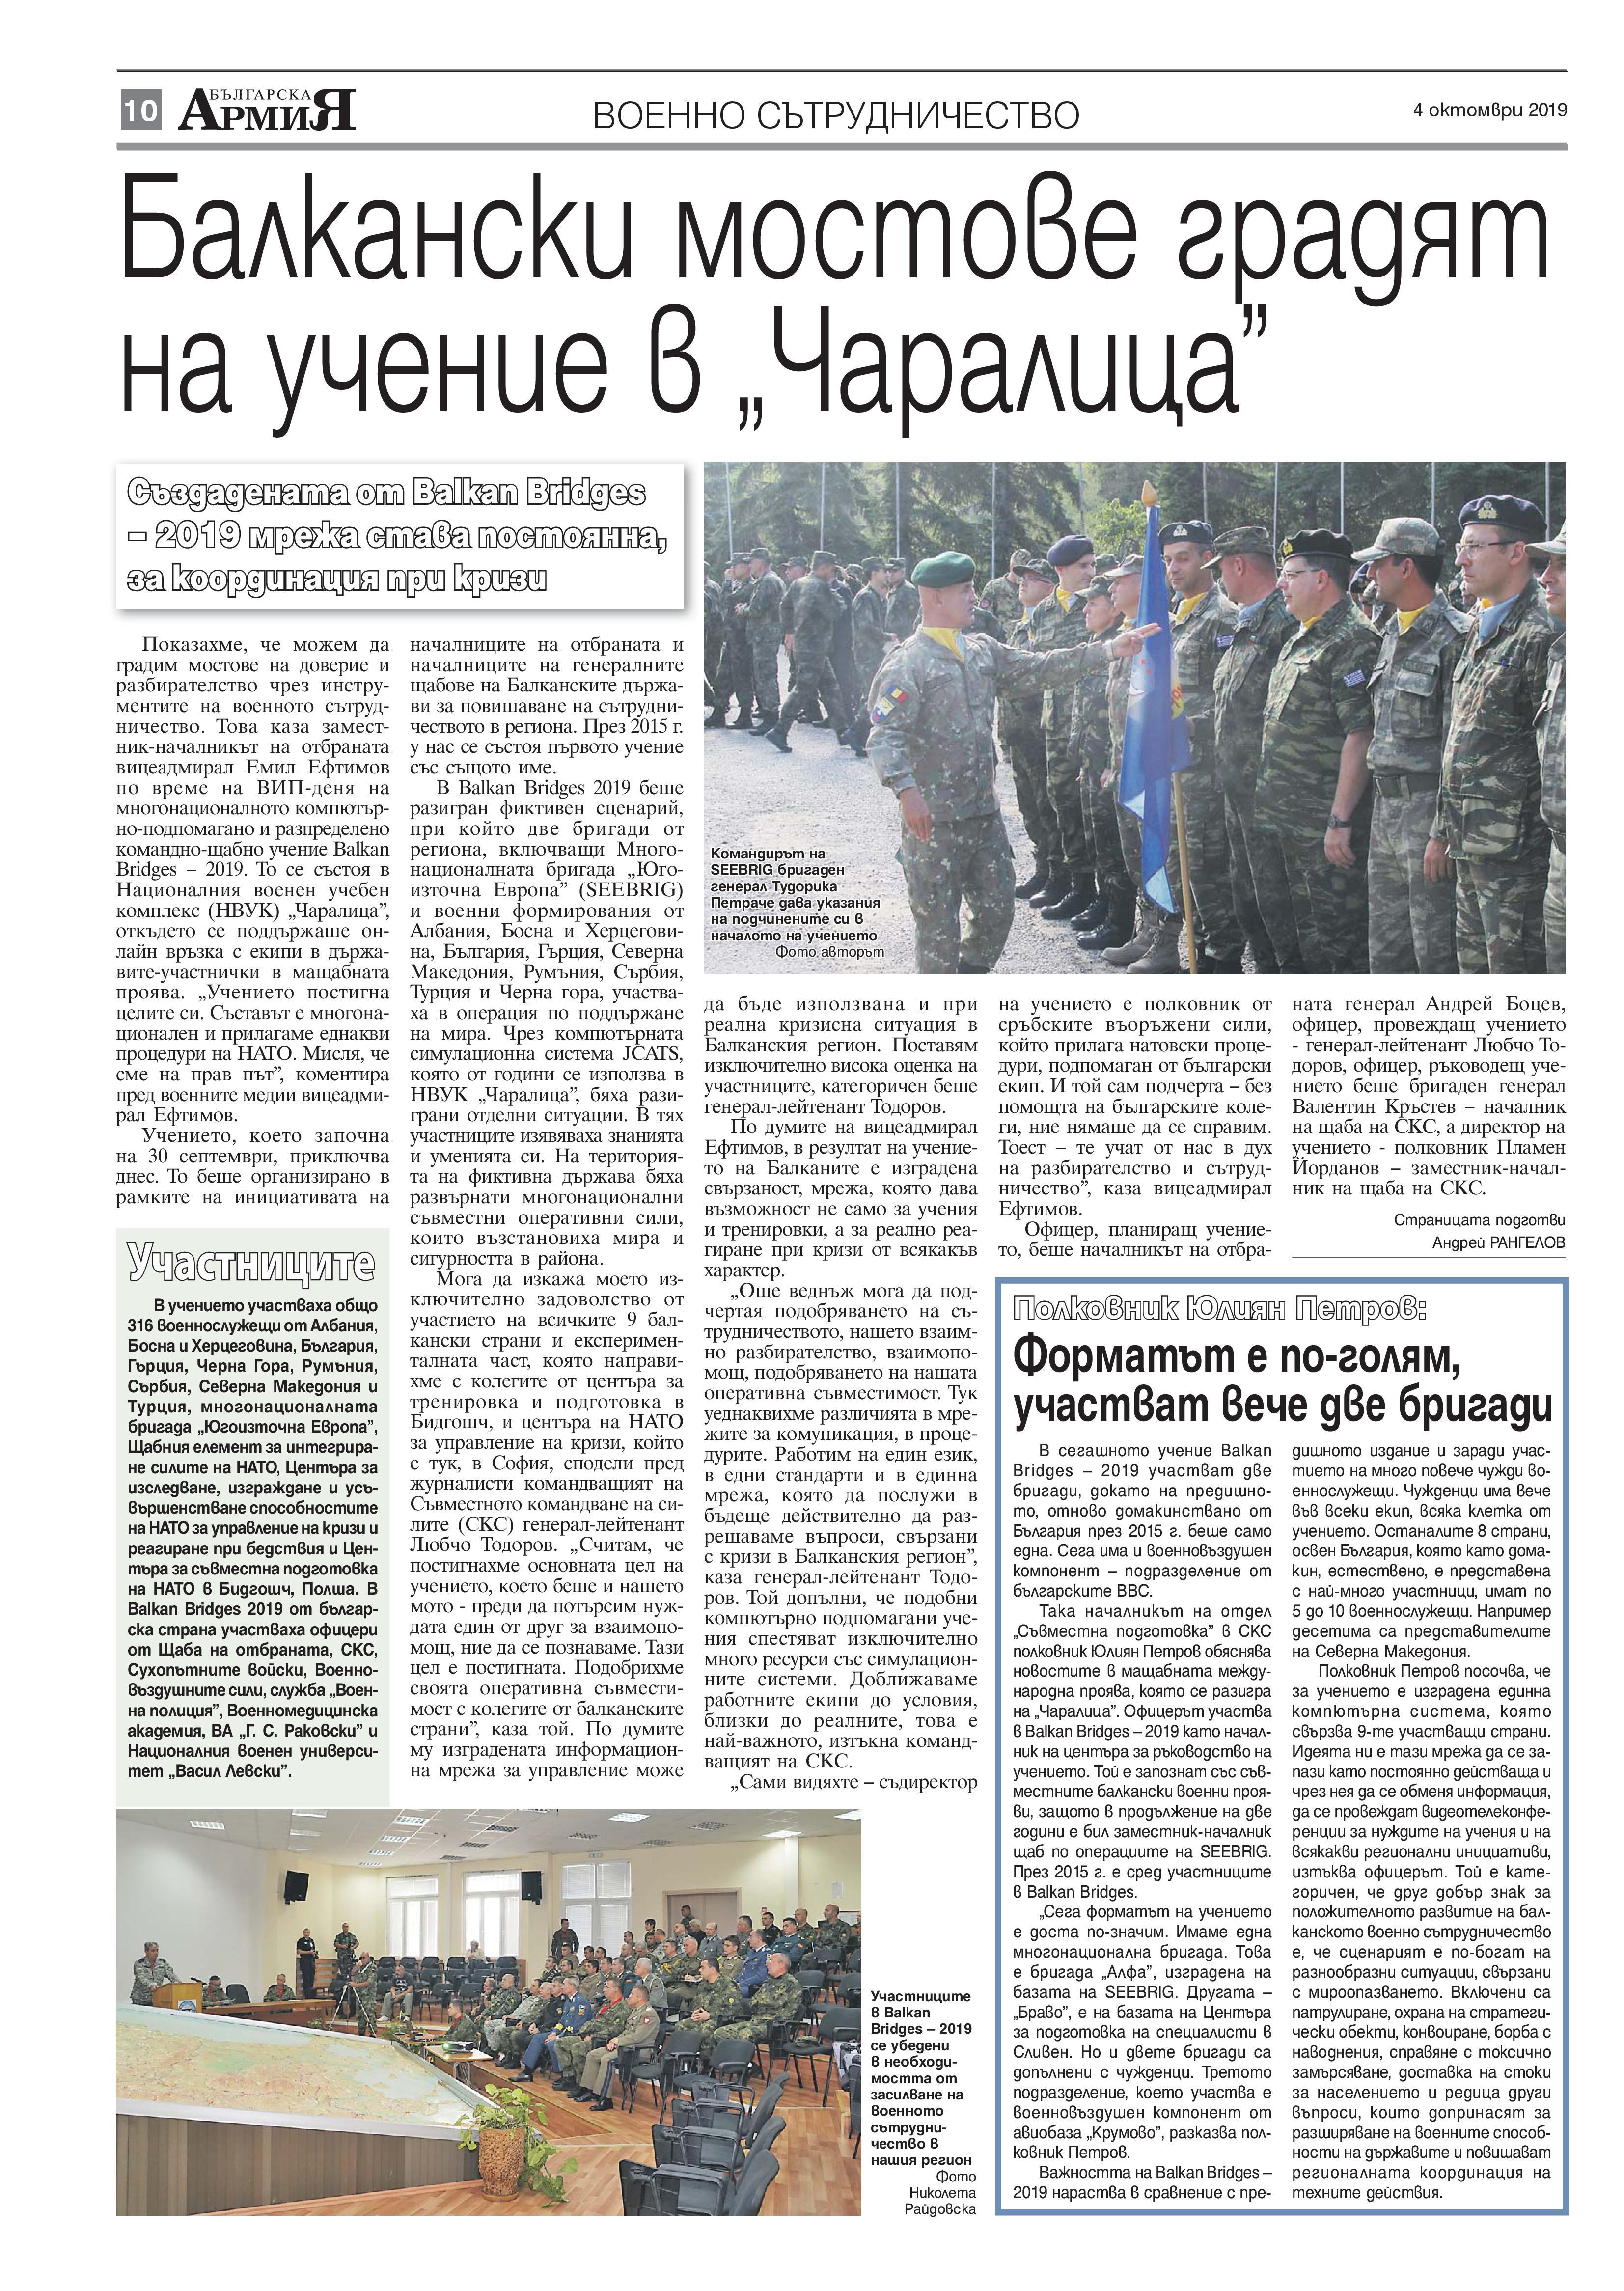 https://www.armymedia.bg/wp-content/uploads/2015/06/10-33.jpg